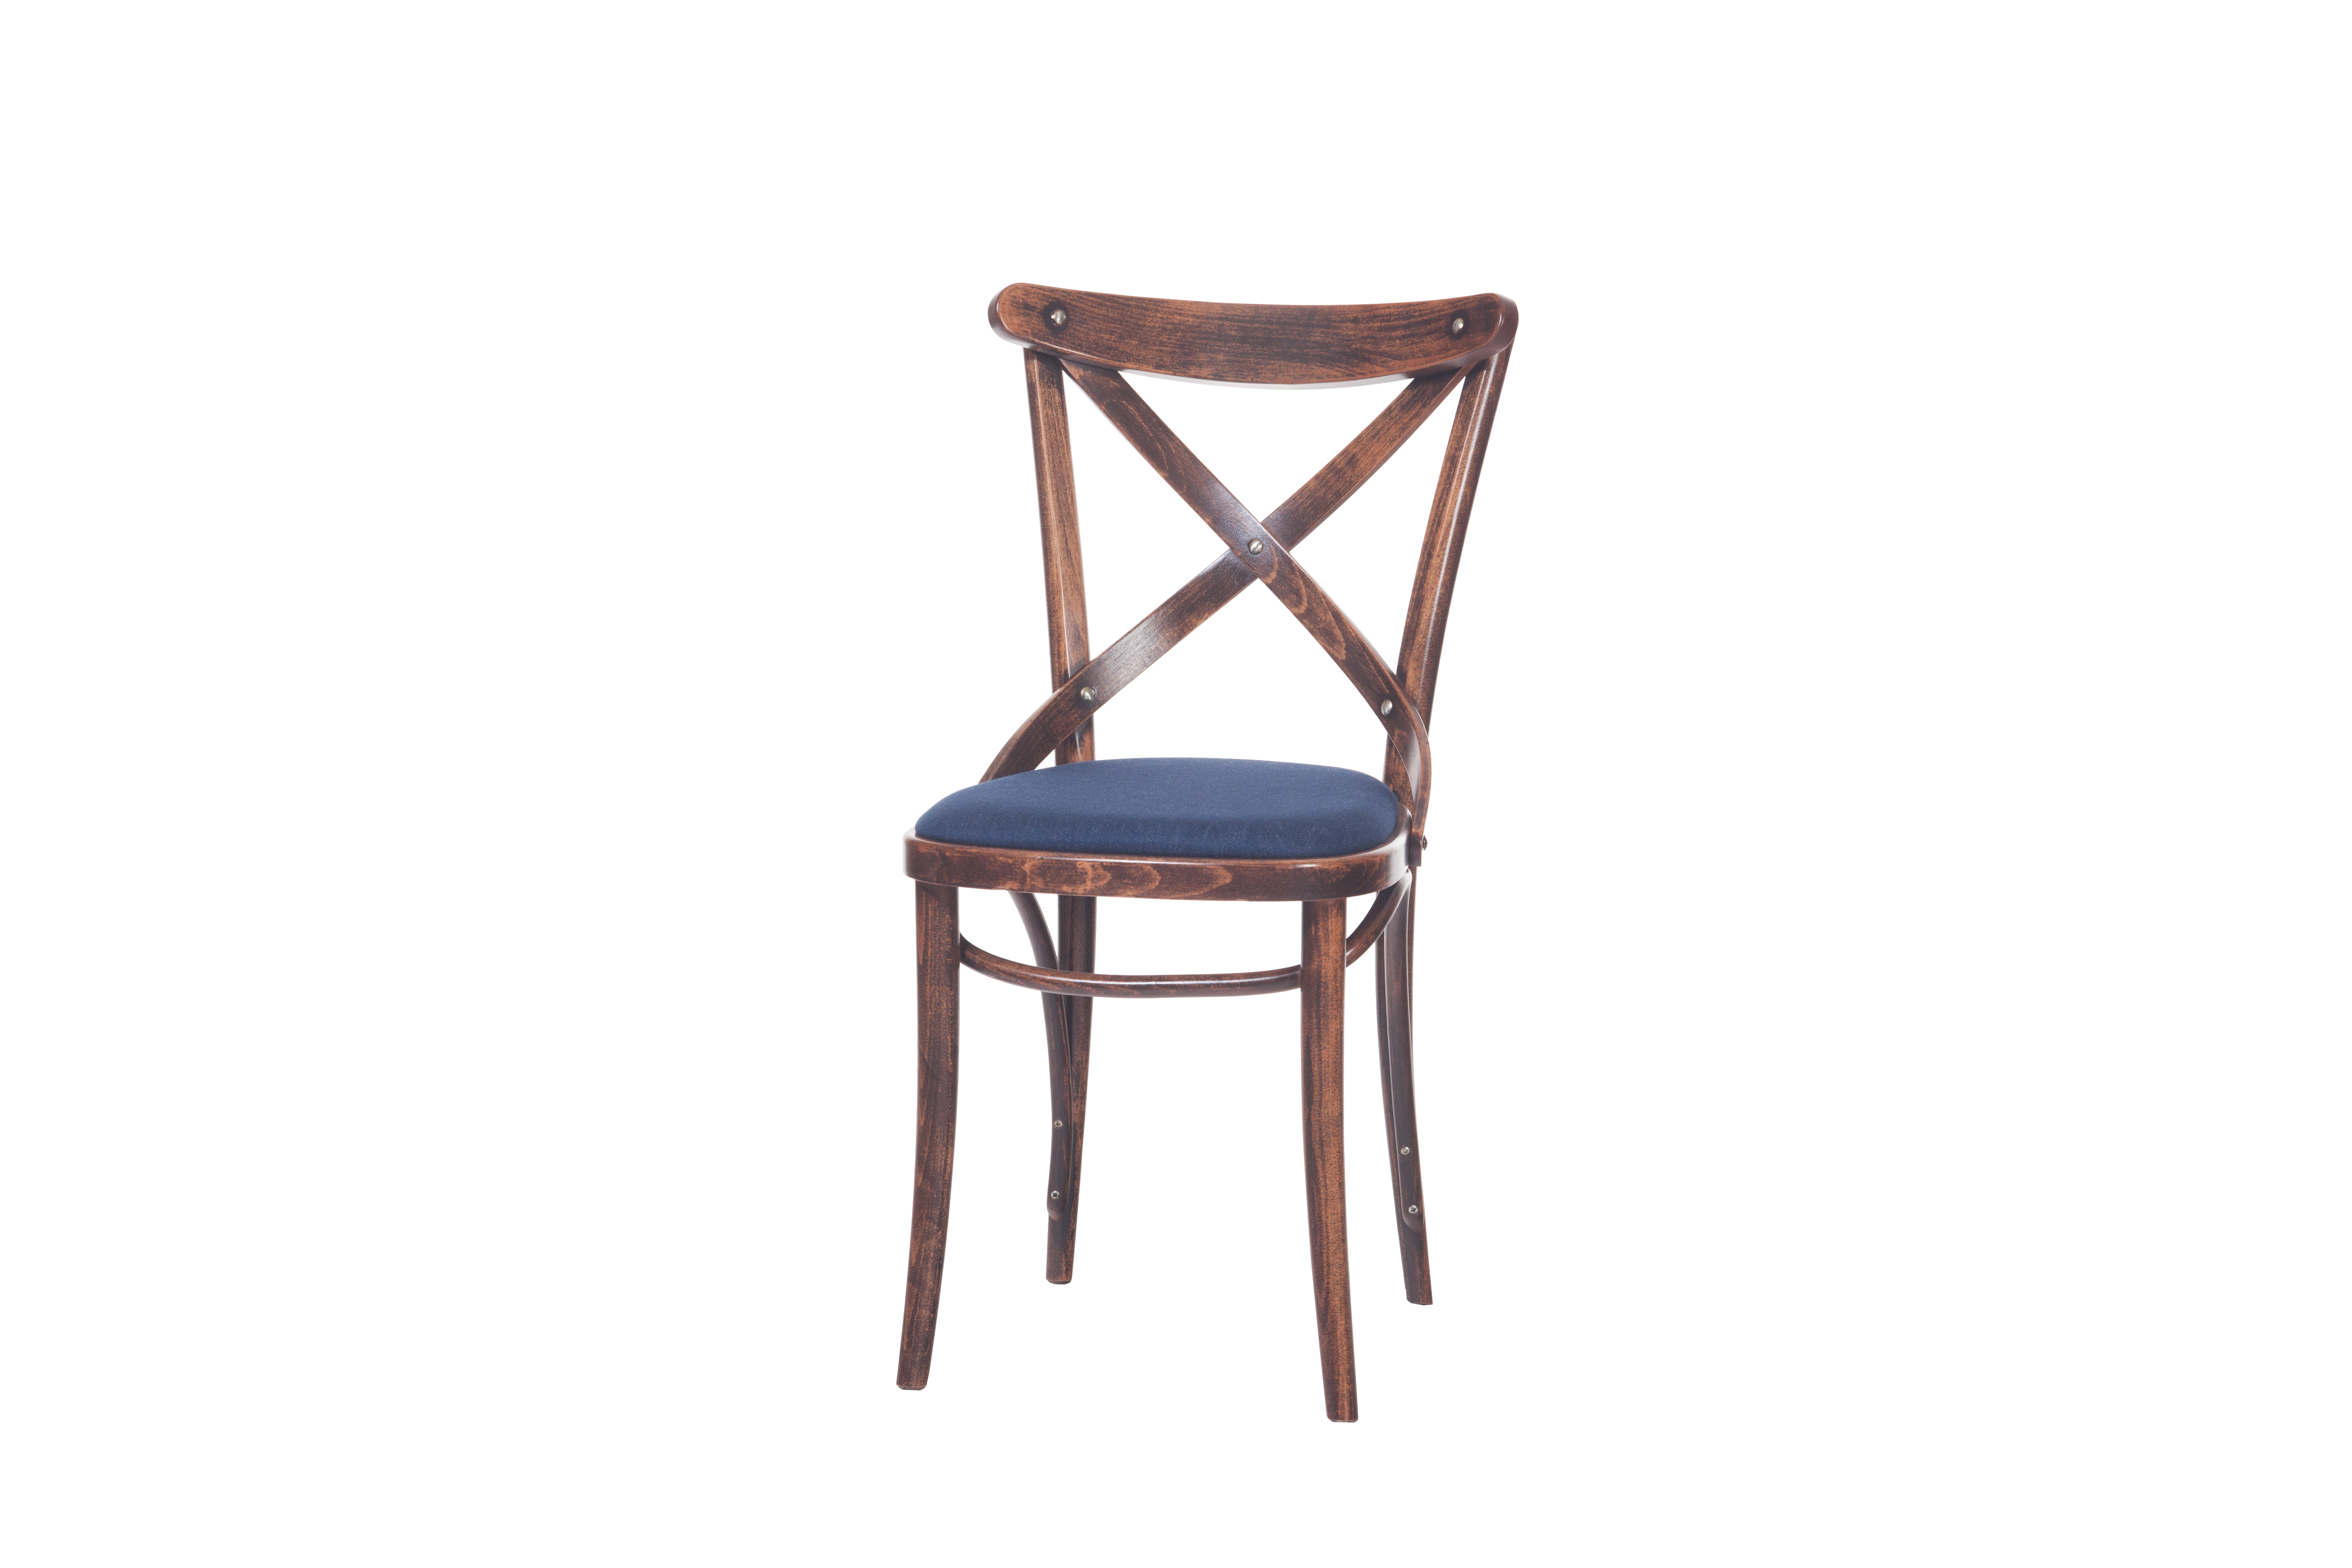 Scaun din lemn de fag, tapitat cu piele 150 Brown, l45xA51xH84,5 cm somproduct.ro